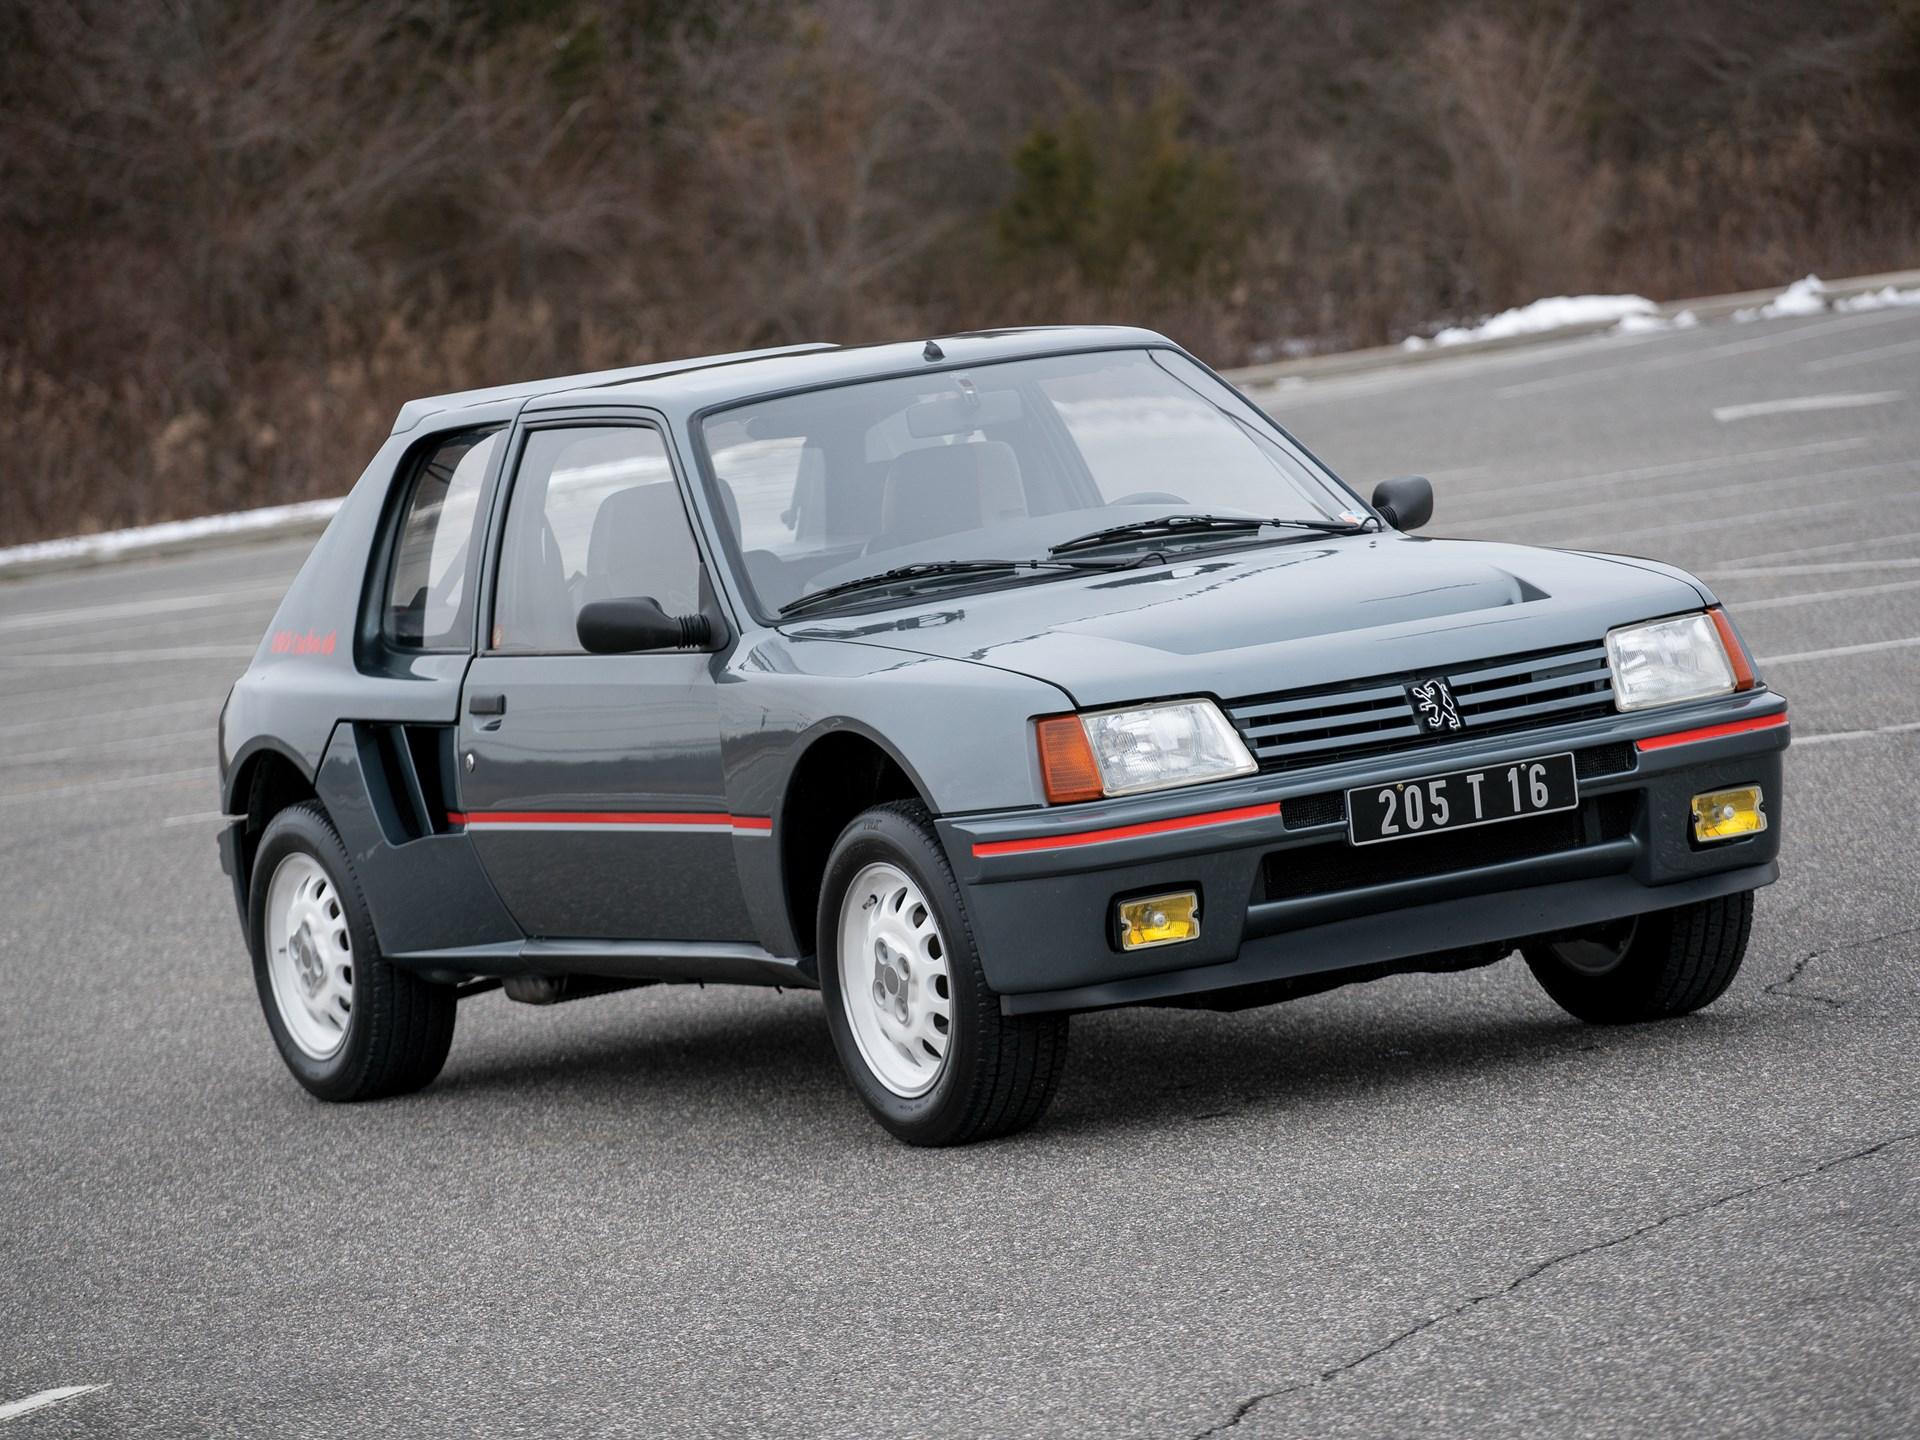 RM Sotheby's - 1984 Peugeot 205 Turbo 16   Amelia Island 2018